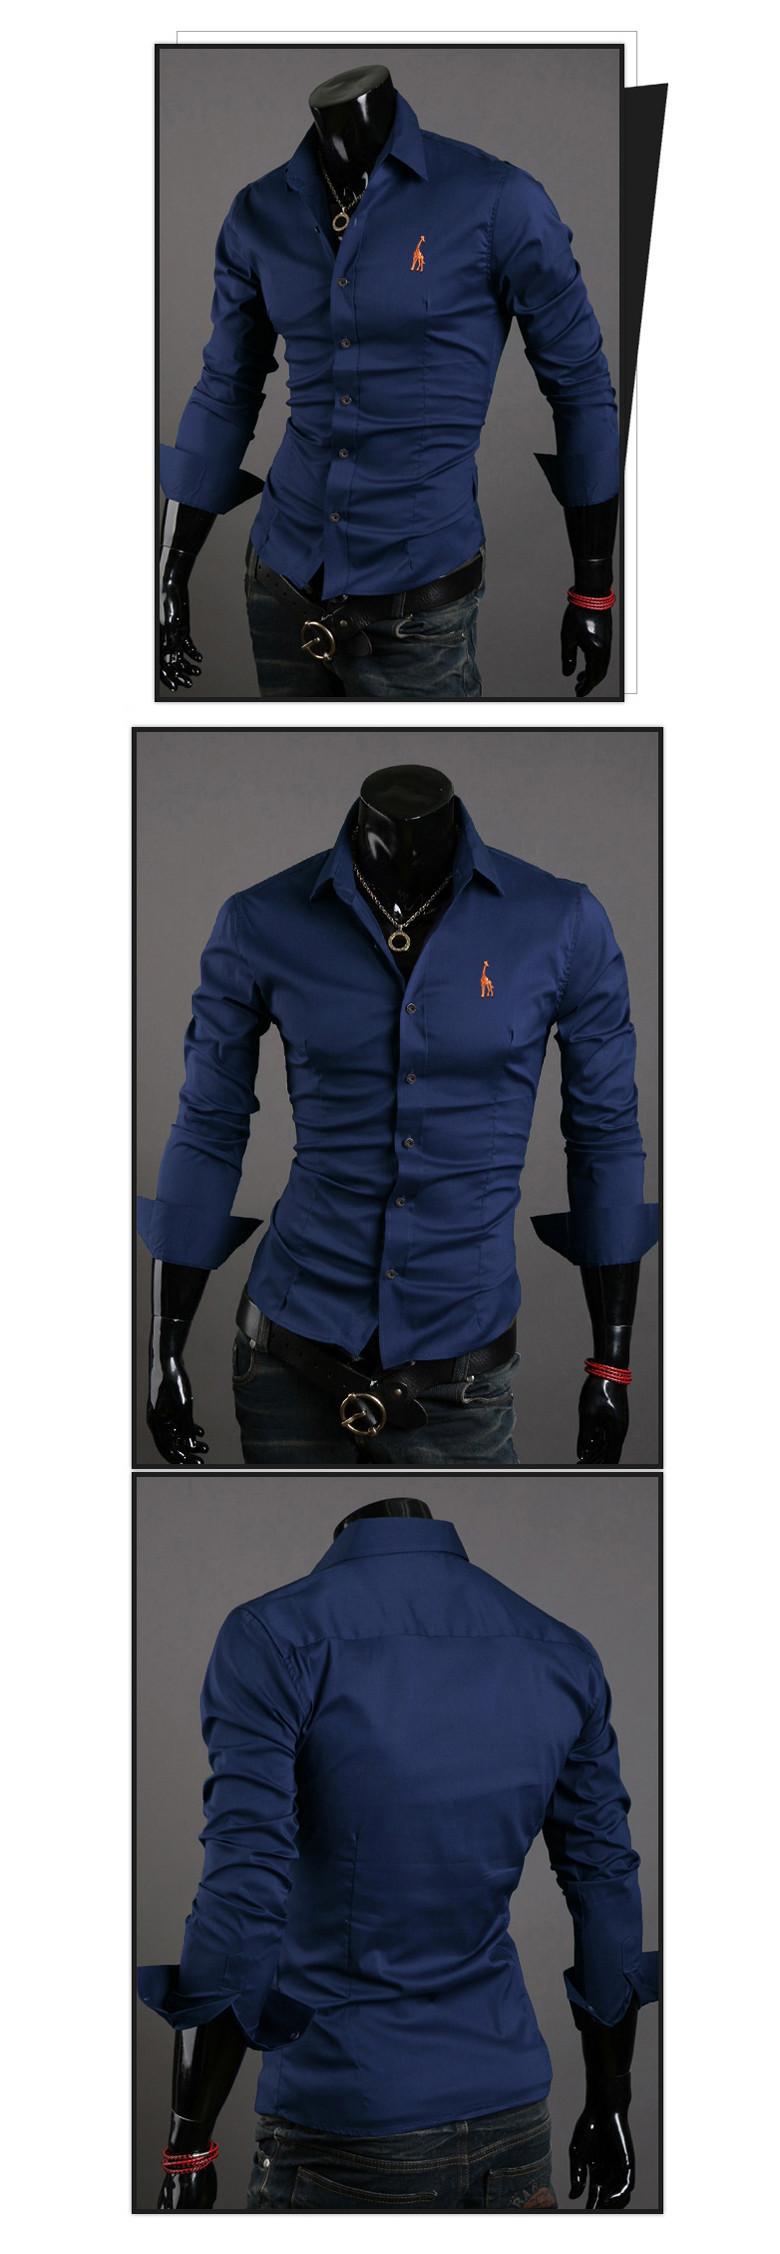 camisa social azul, camisa social azul marinho, camisa social azul caneta, camisa social masculina, camisa slim fit, #camisaazul, #camisasocialmasculina, shopjmix.com, www.shopjmix.com, #shopjmix